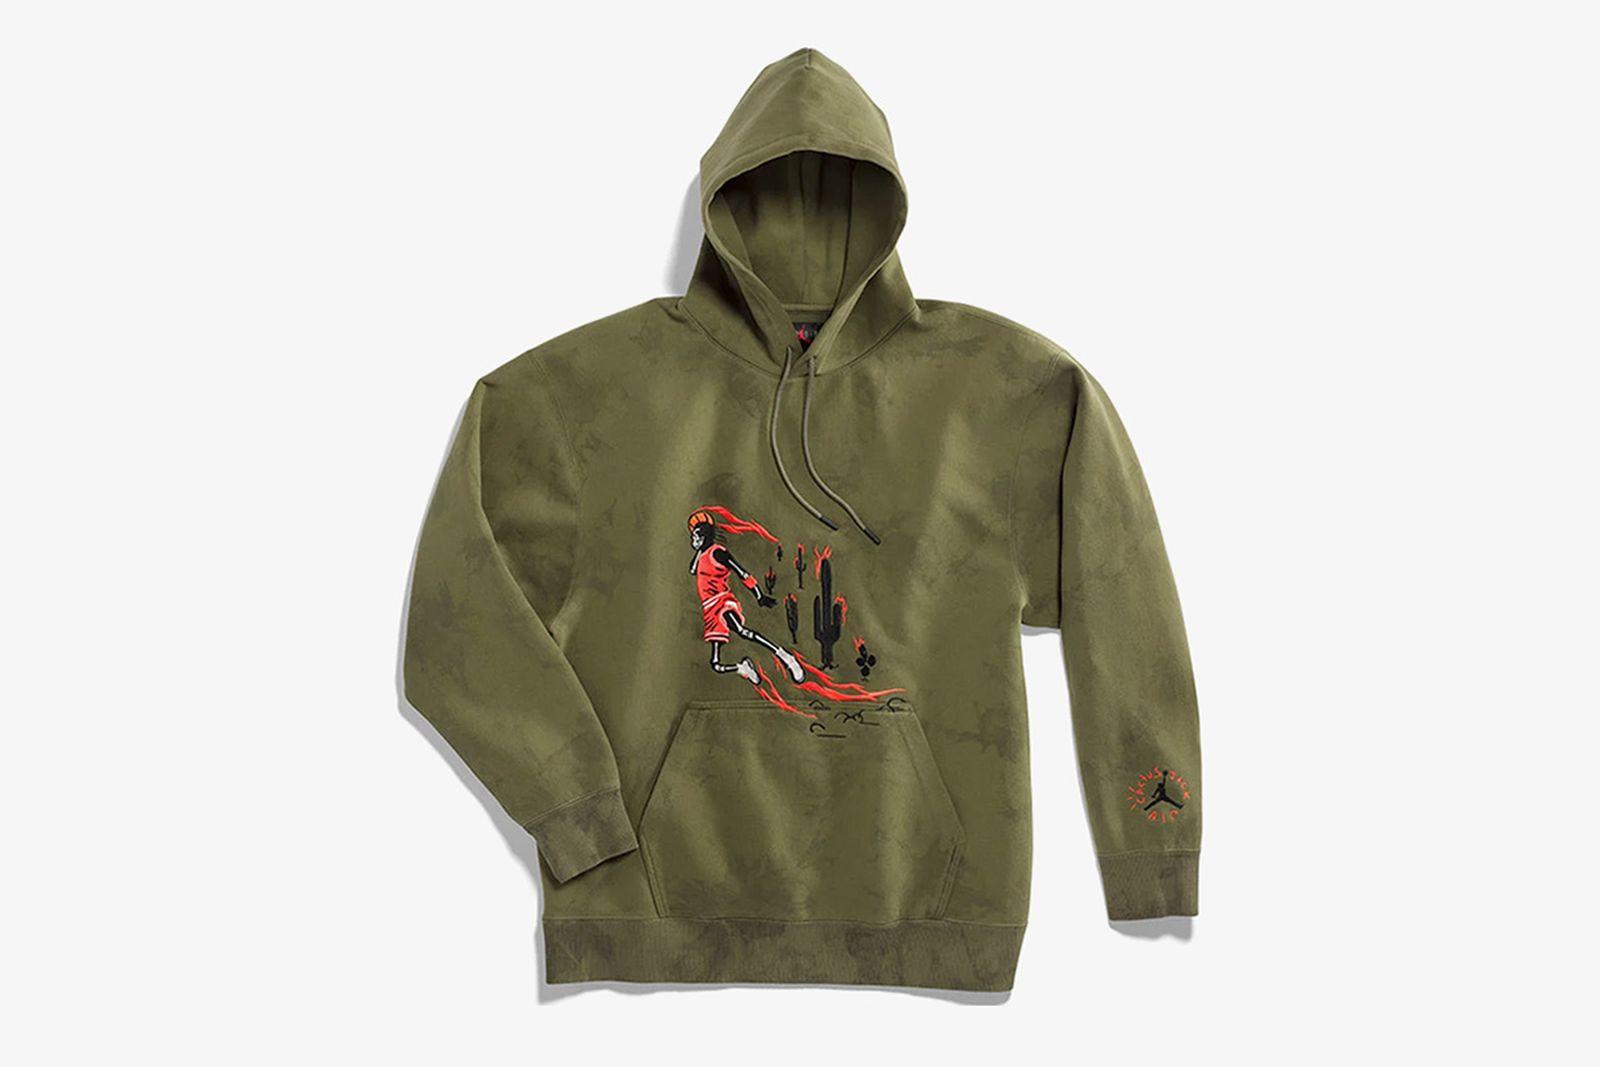 travis scott nike collab Nike Air Jordan 6 jordan brand